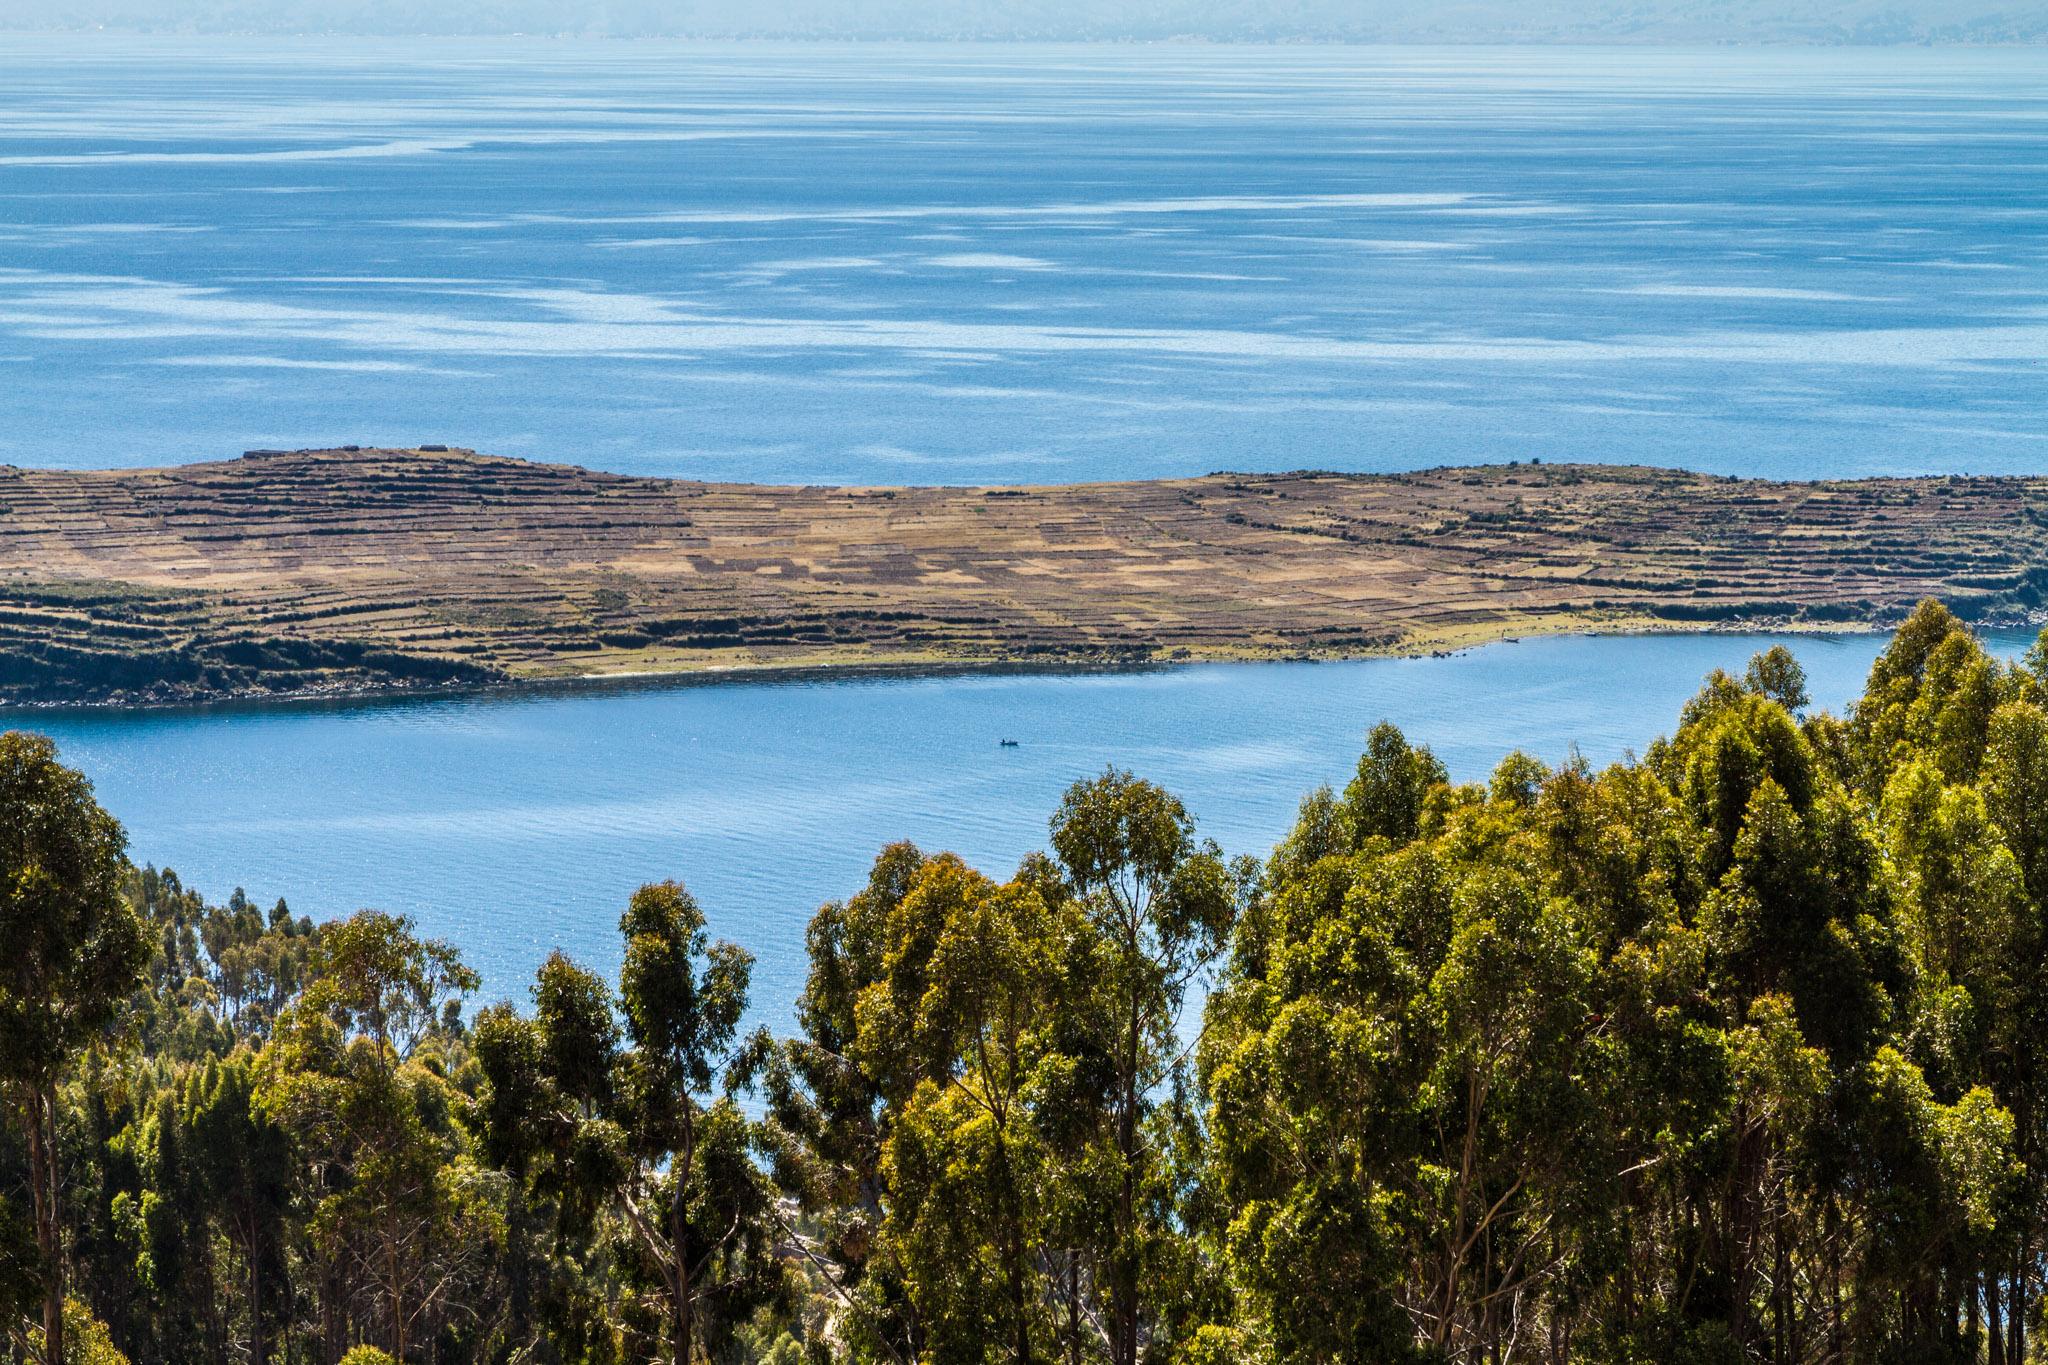 Ali-Barqawi-Studios-Explore-Series-Travel-Adventure-Documentary-C4CGAZA-Bolivia-Lake-Titicaca-2015-090.jpg